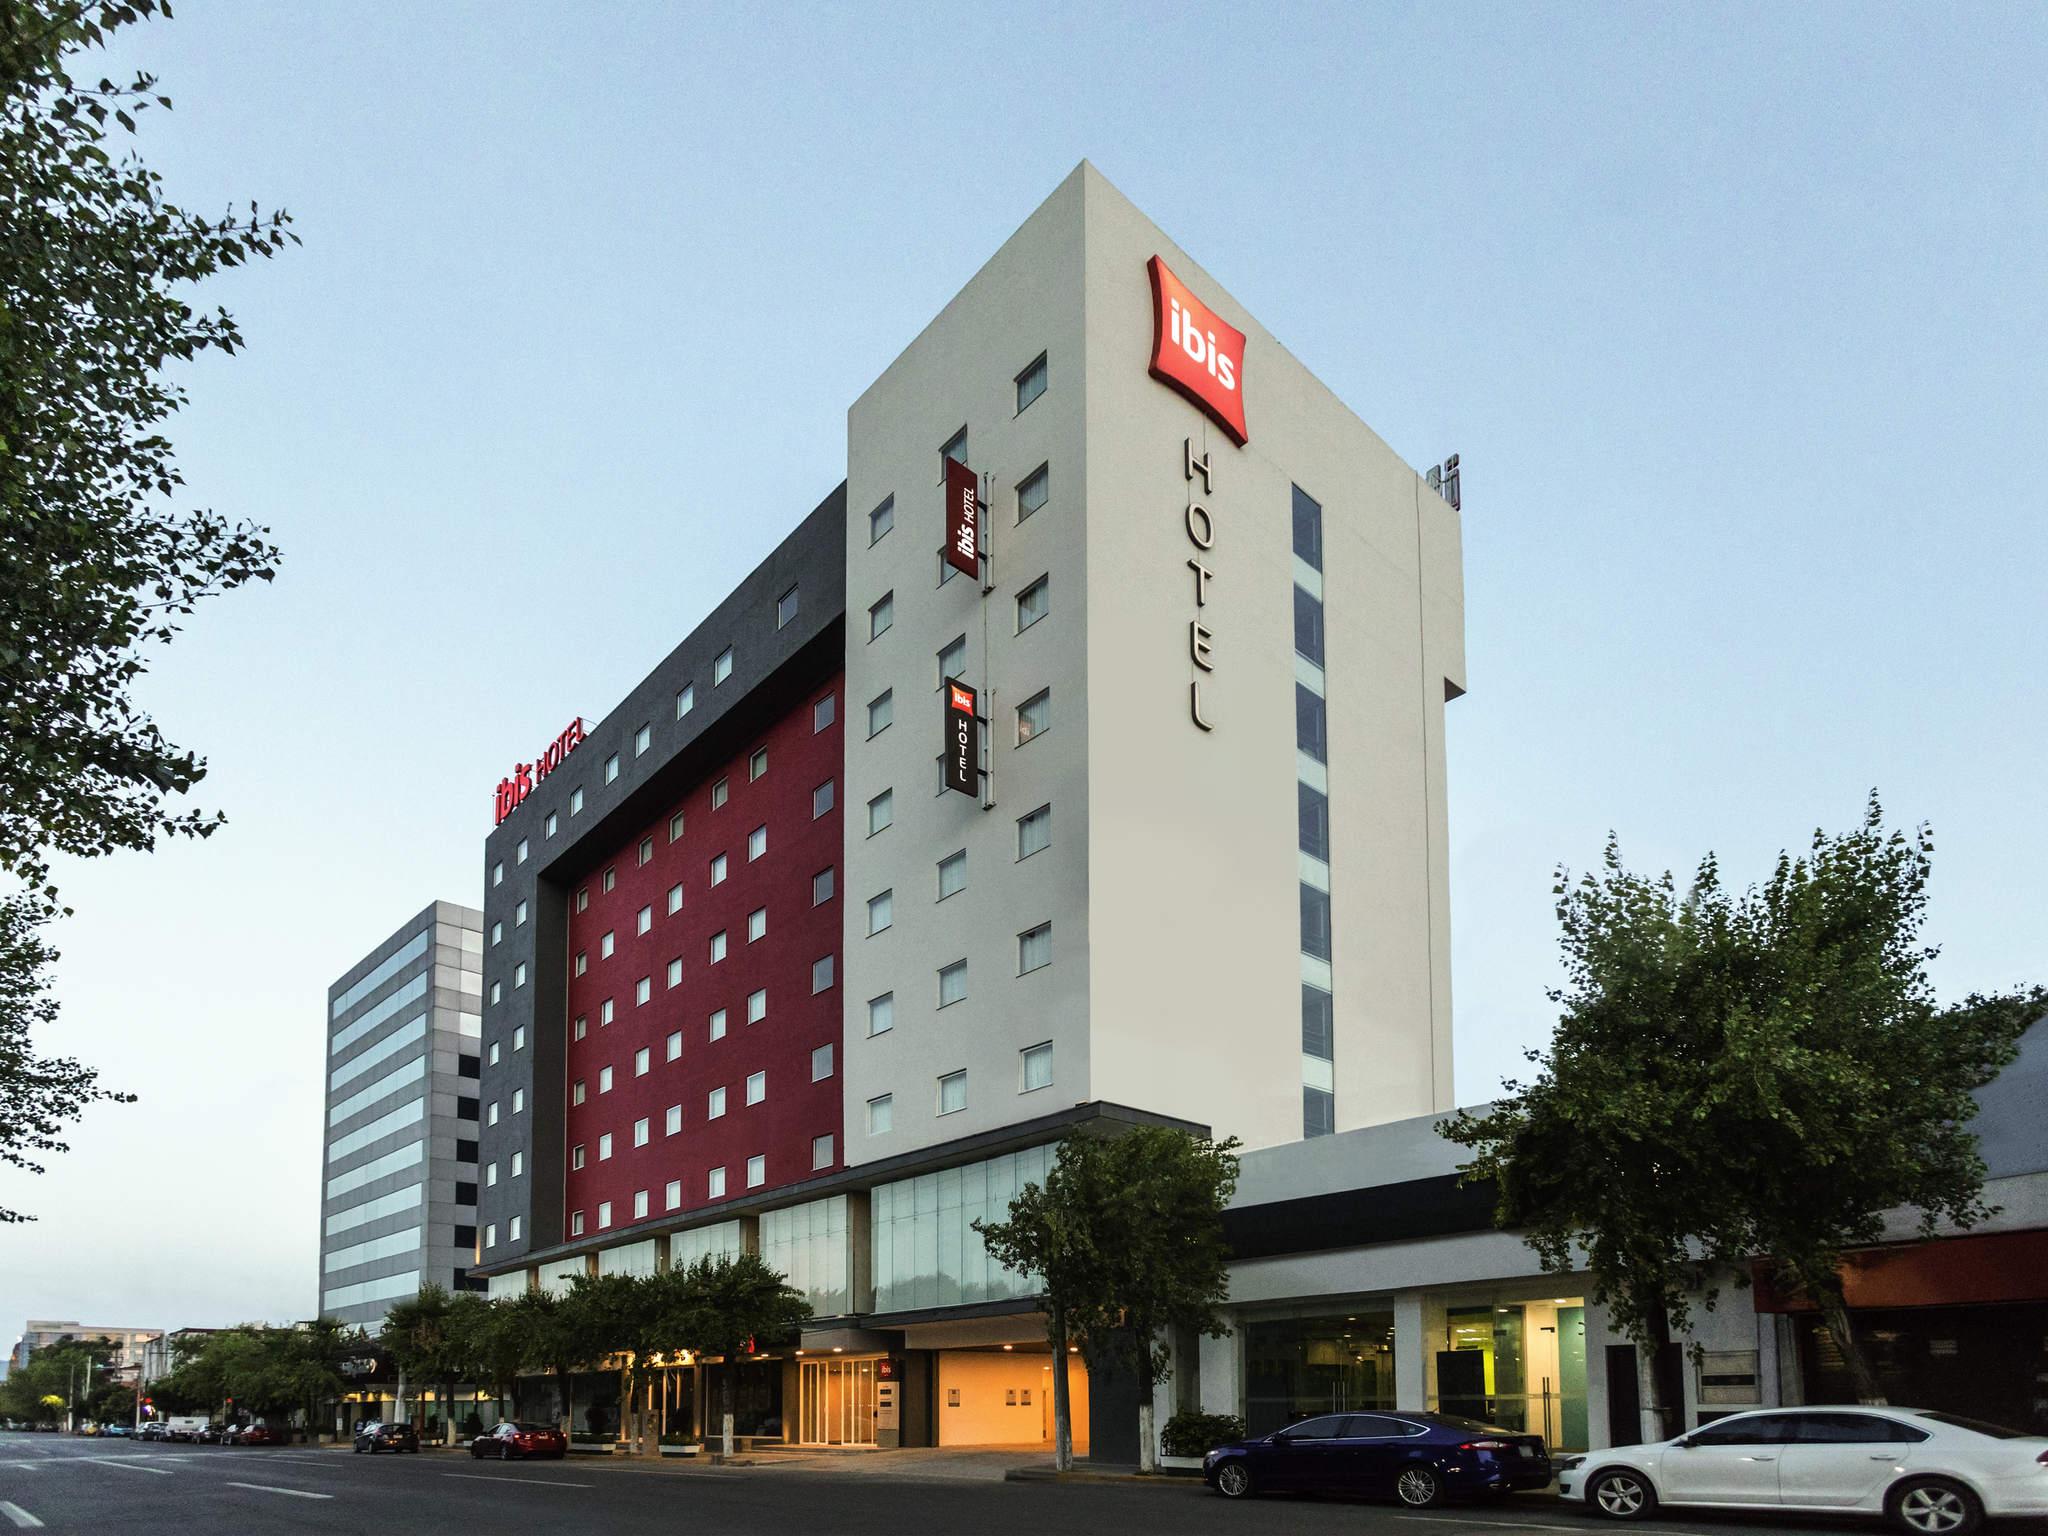 Hotel – ibis Mexico Tlalnepantla (abre em junho de 2018)